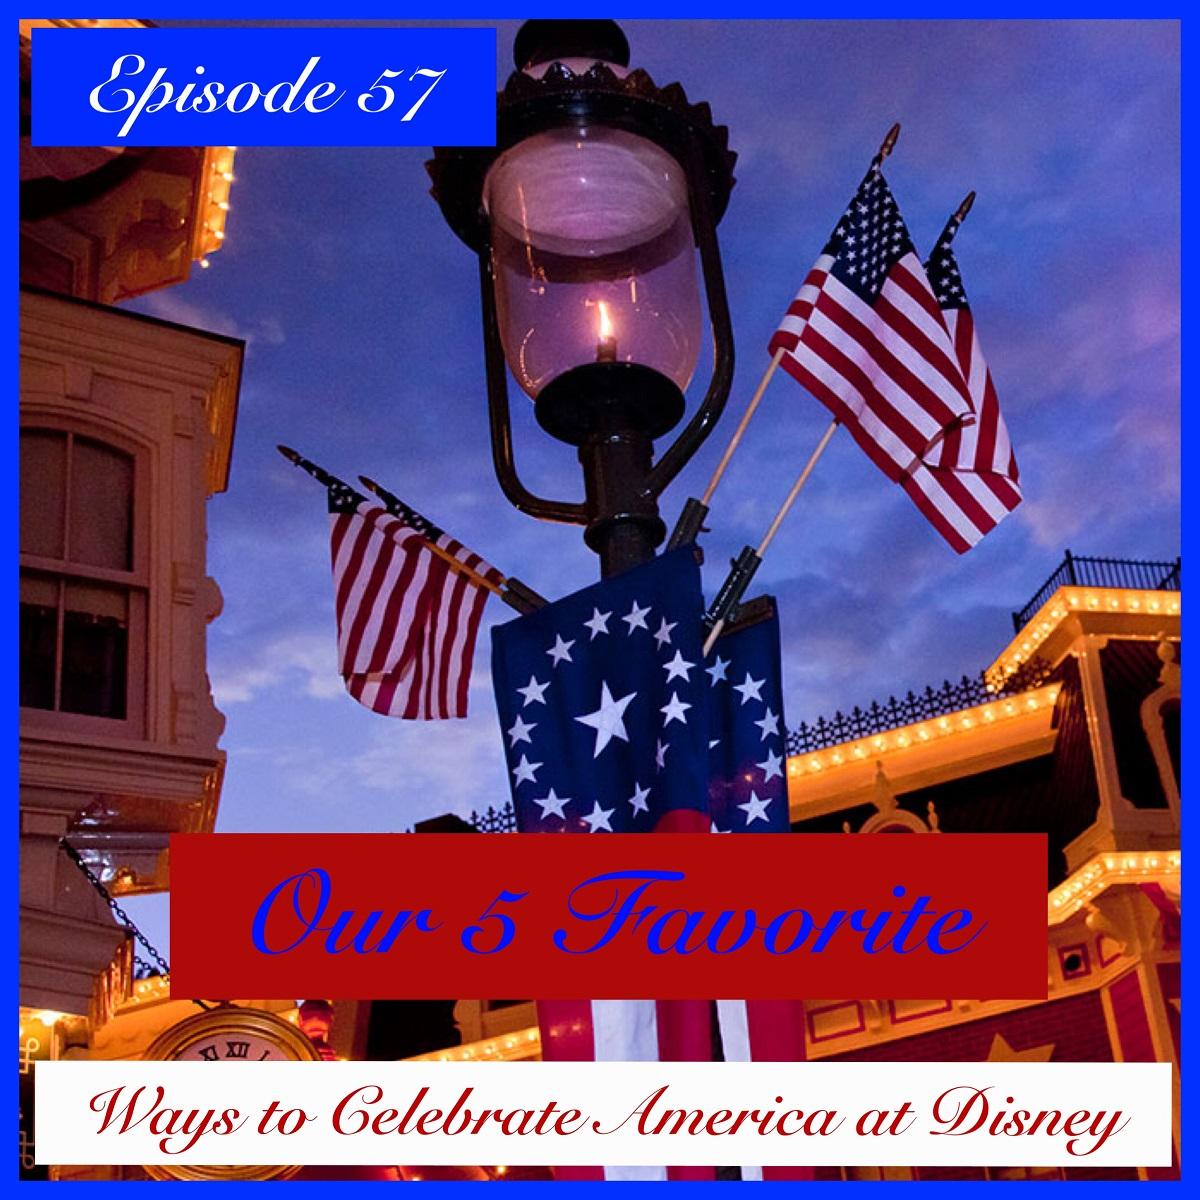 Celebrate America at Disney